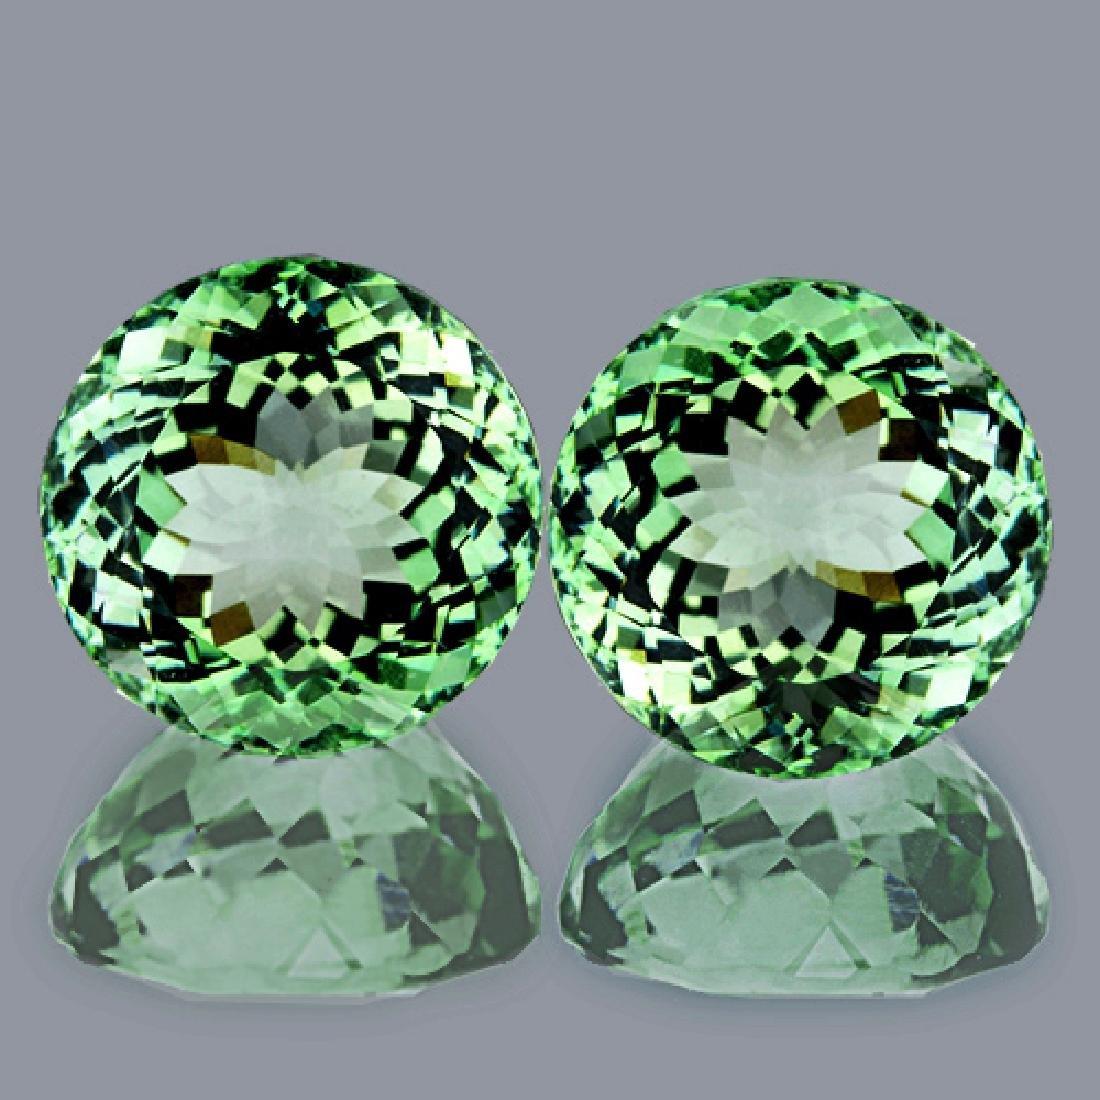 Natural Healing Green Amethyst Pair 9.50 mm - Flawless